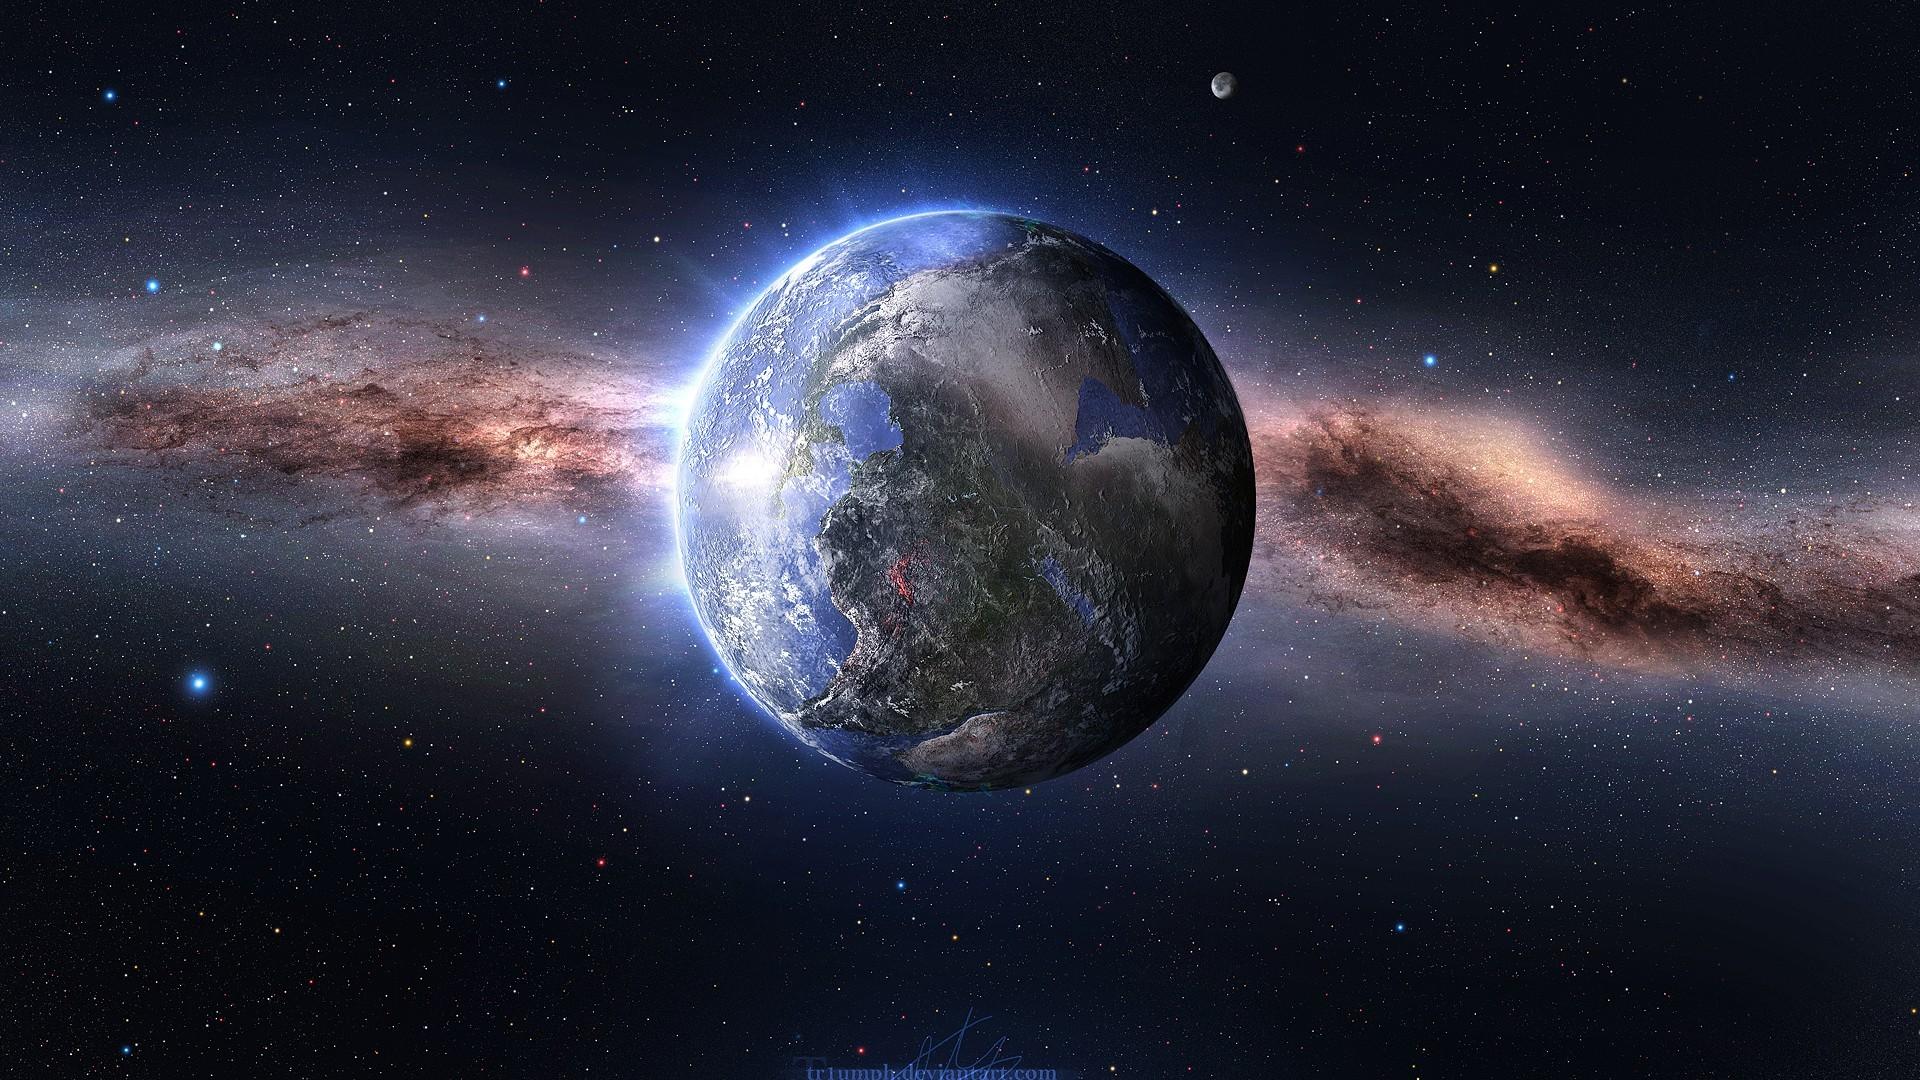 Space Desktop Backgrounds 75 Pictures